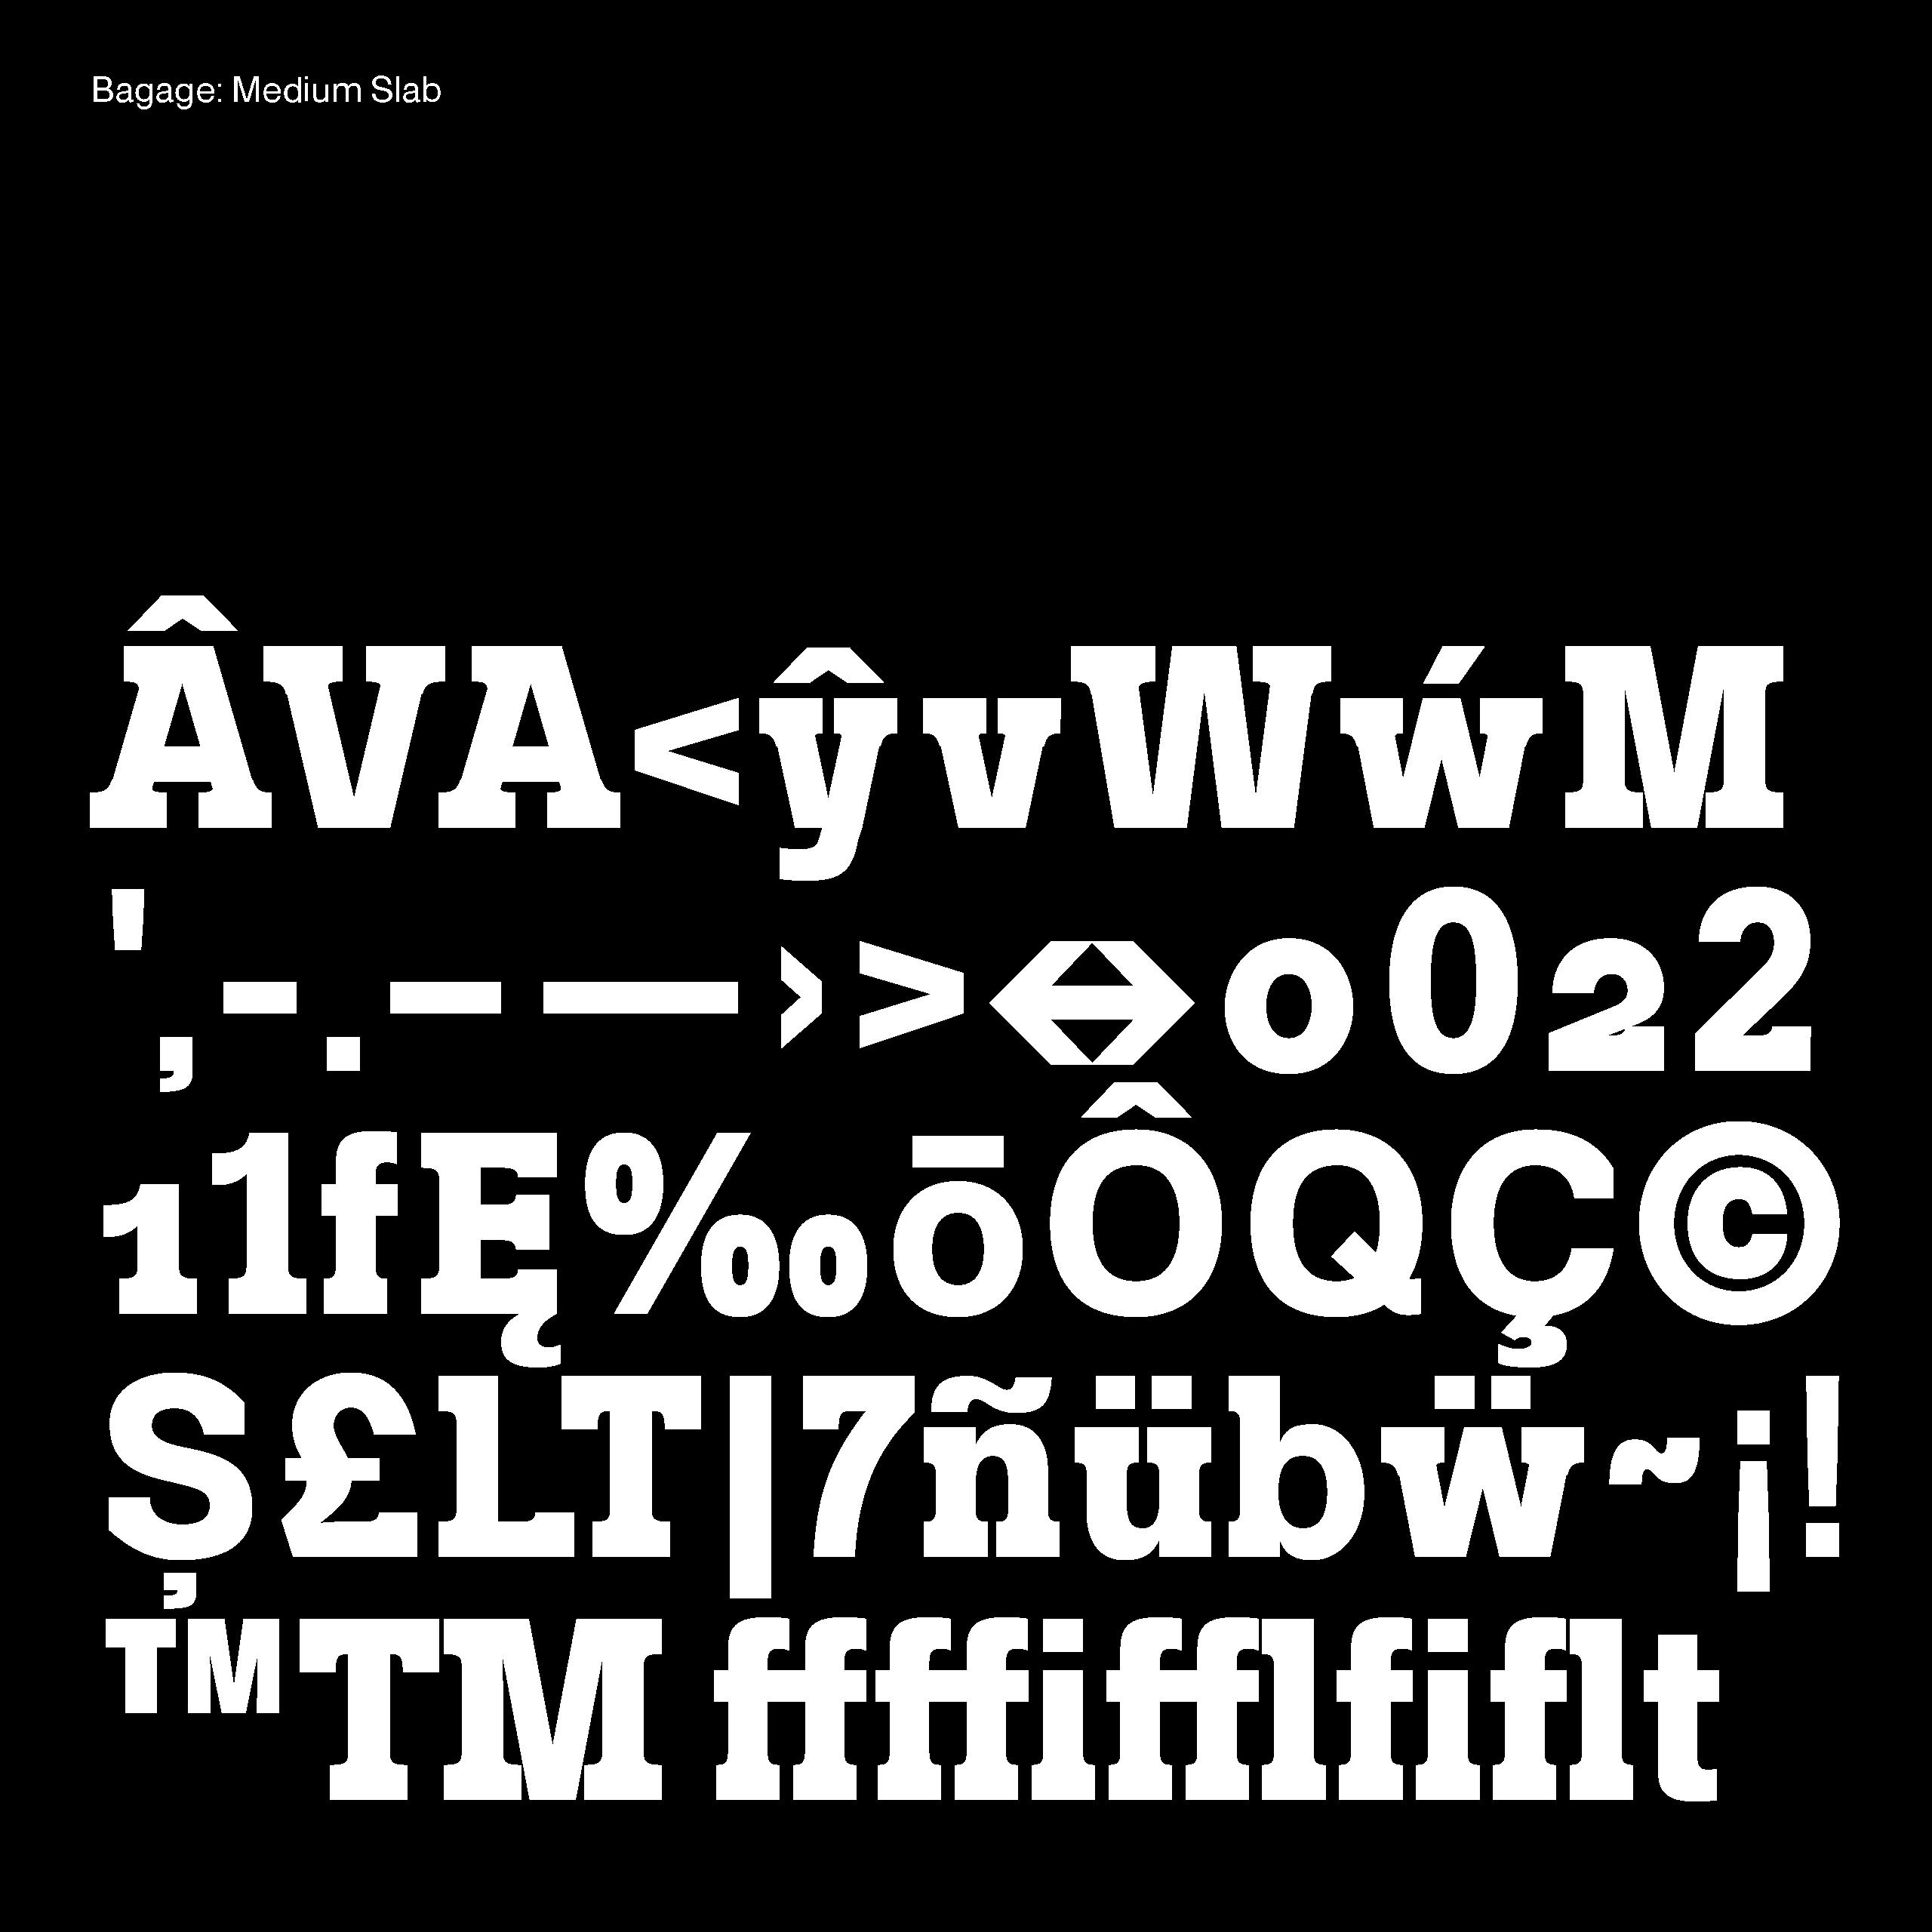 Daniel_Stuhlpfarrer_Spekulative-Schriftgestaltung-Speculative-Type-Design_WEB28